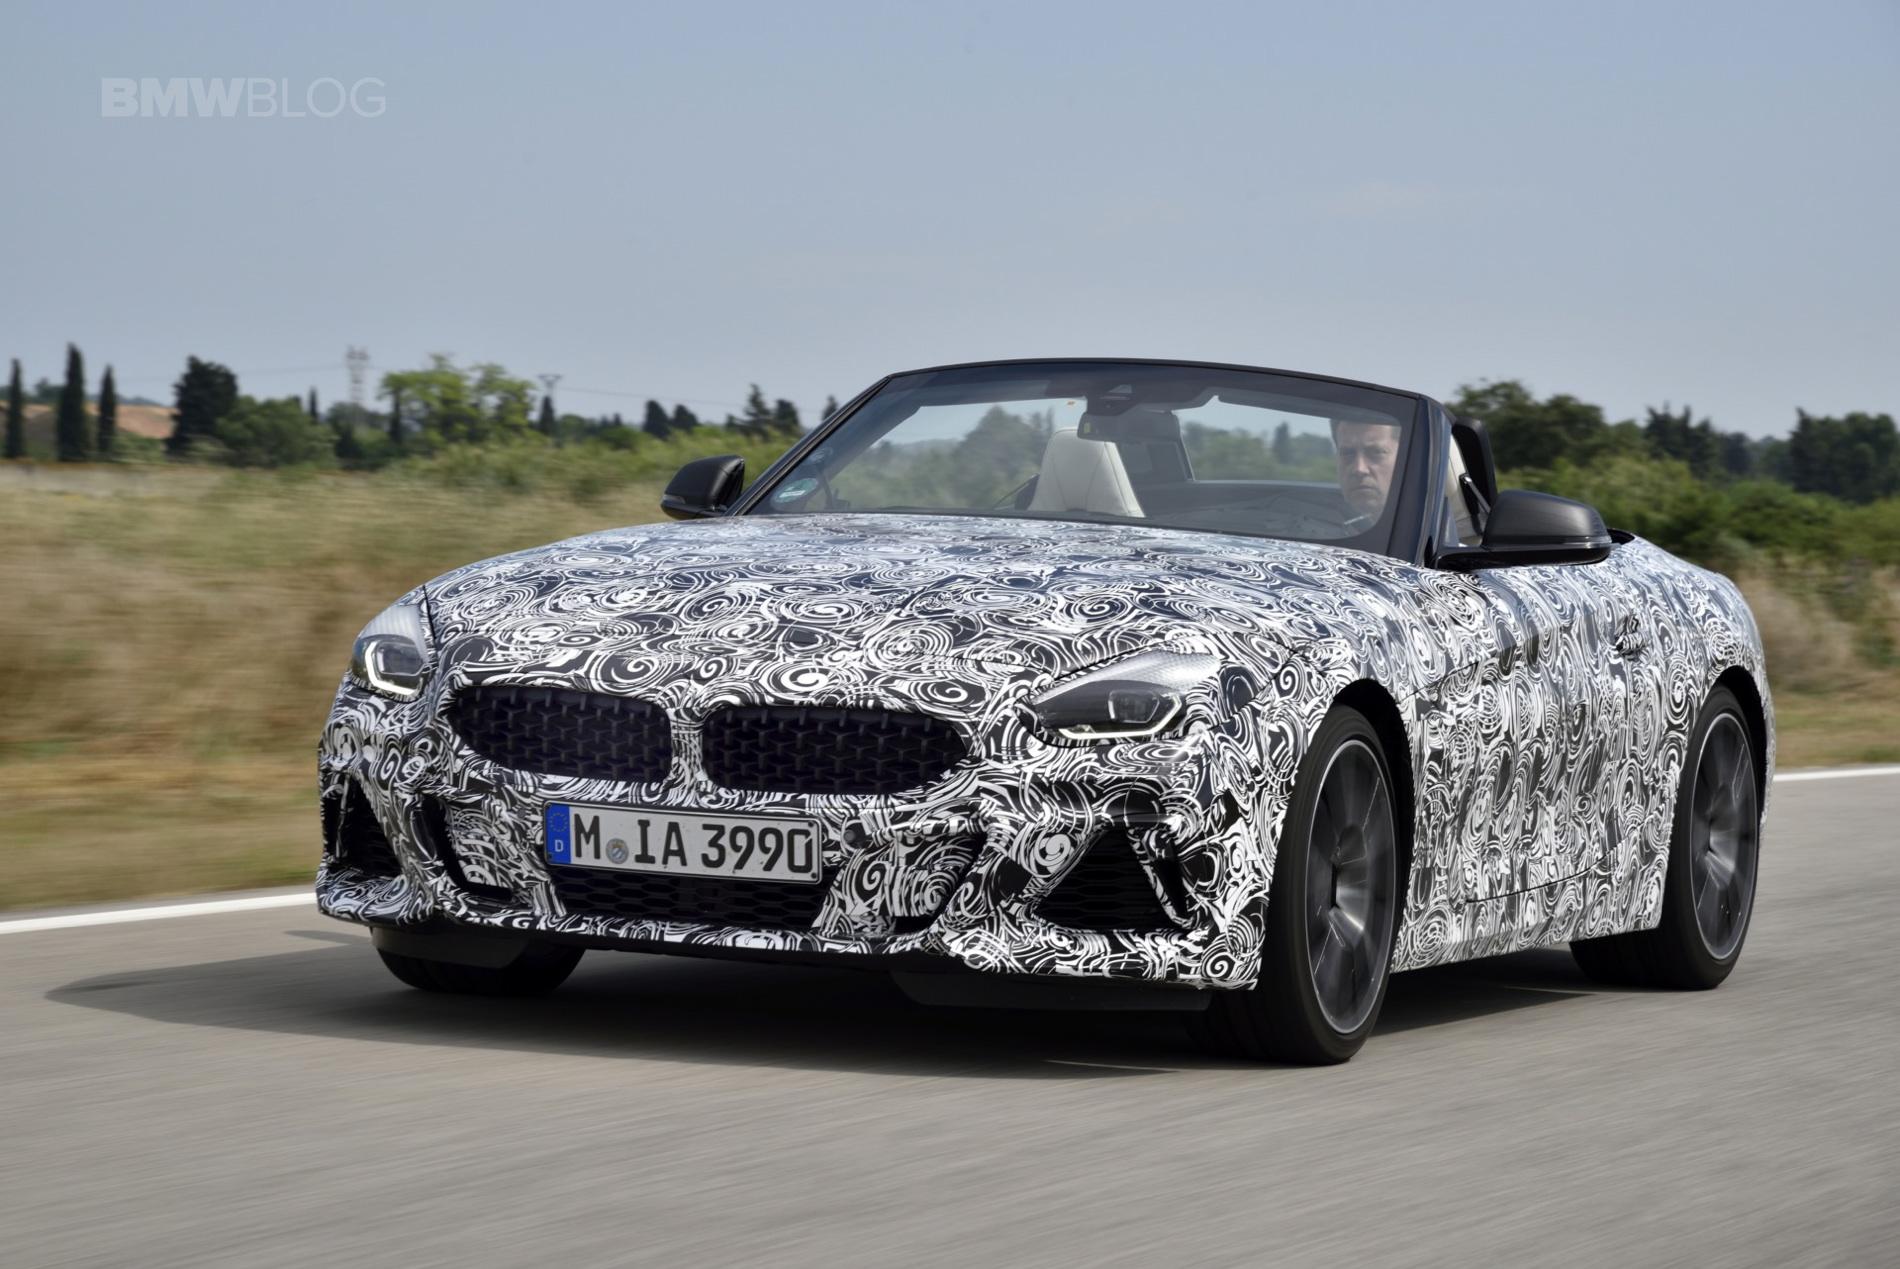 BMW G29 Z4 pre drive 30